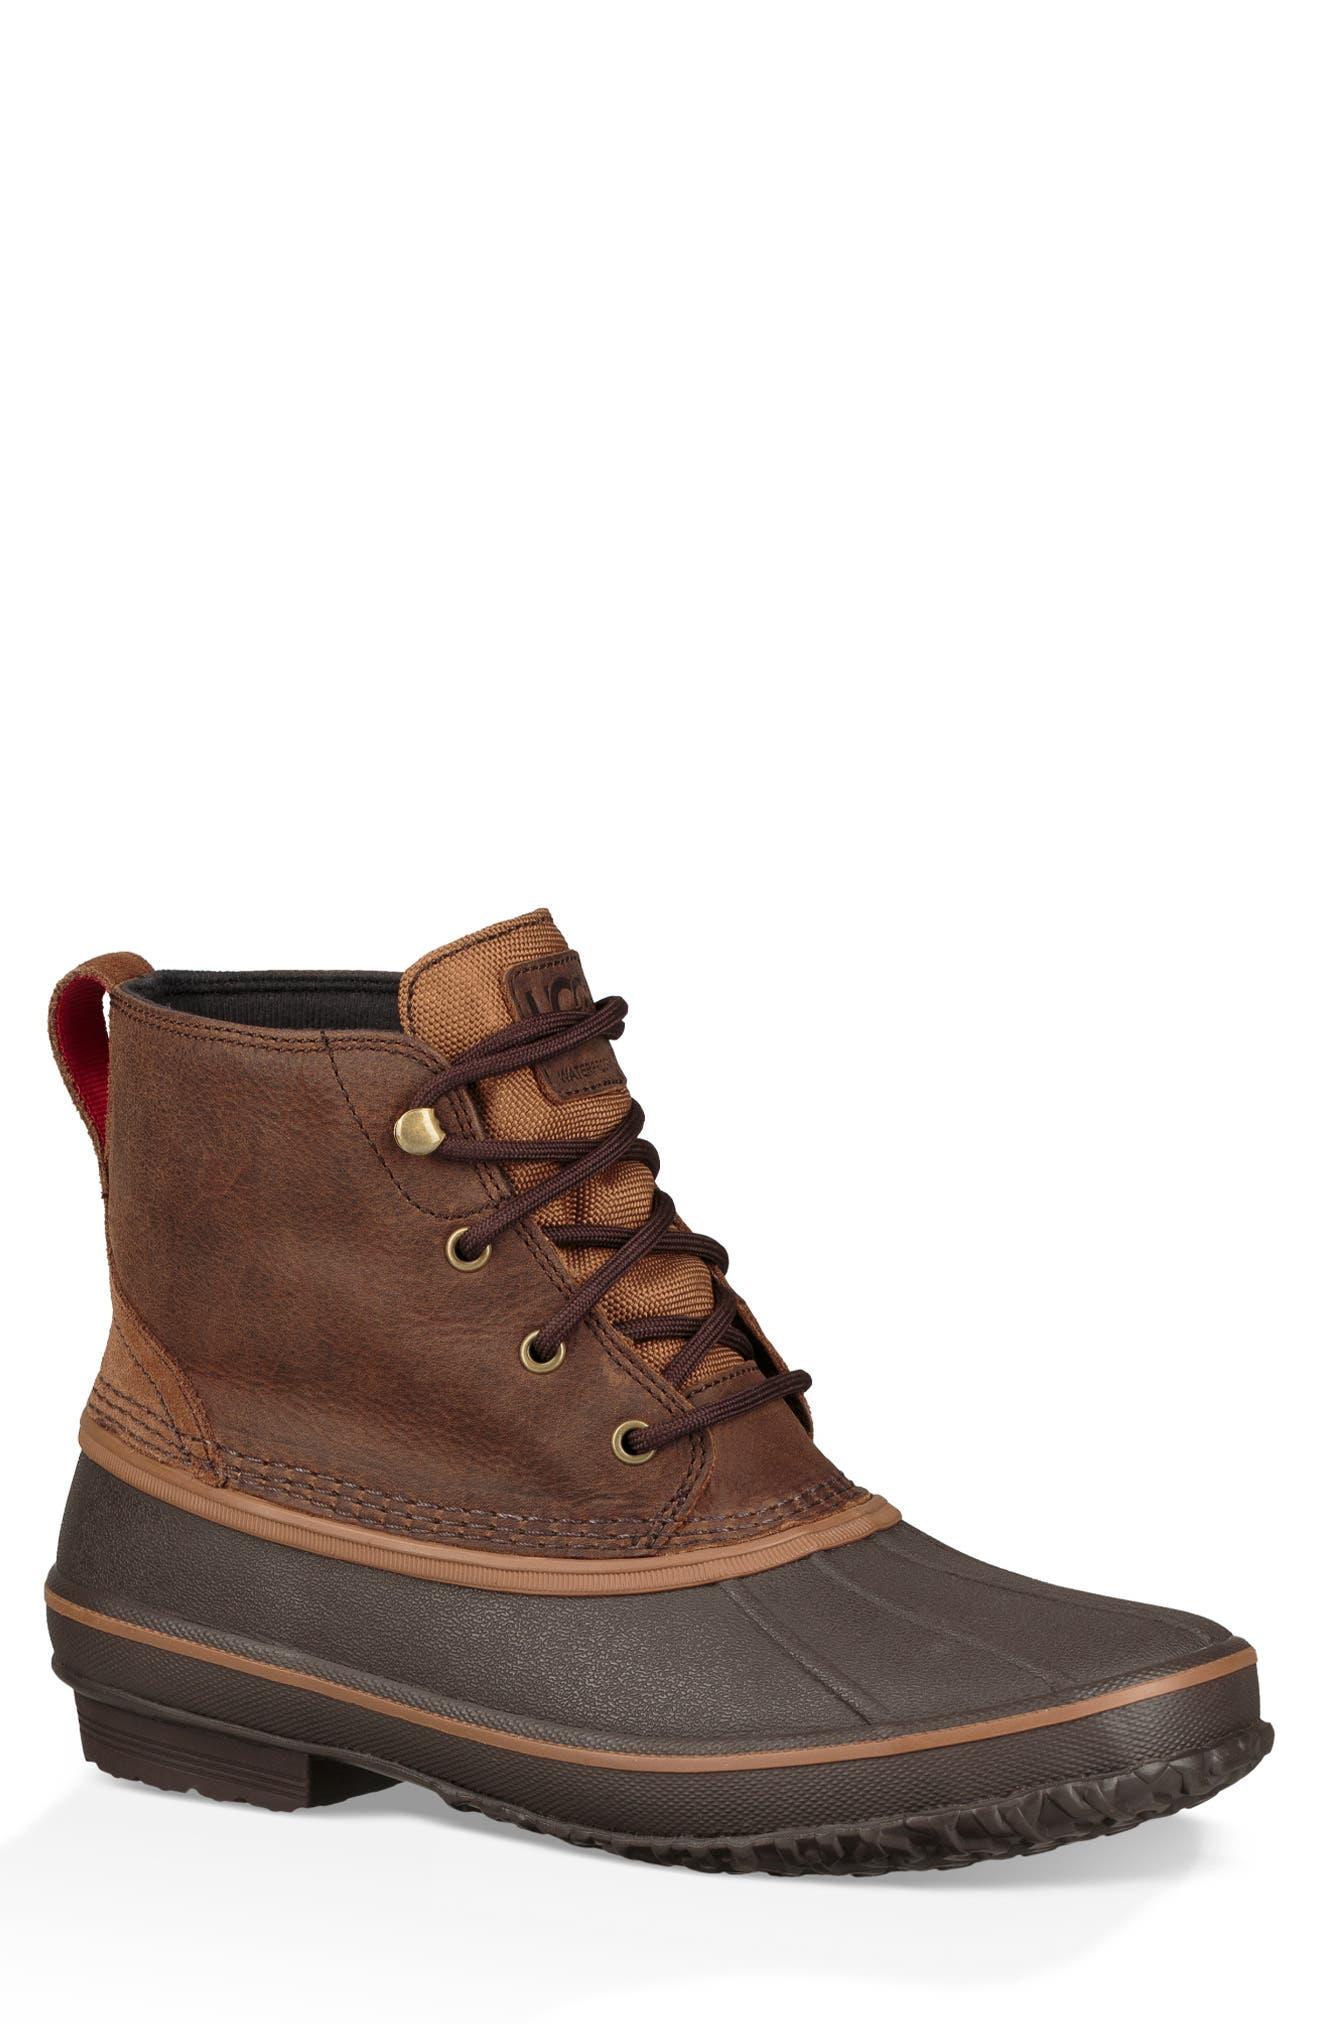 Ugg Zetik Waterproof Rain Boot- Brown